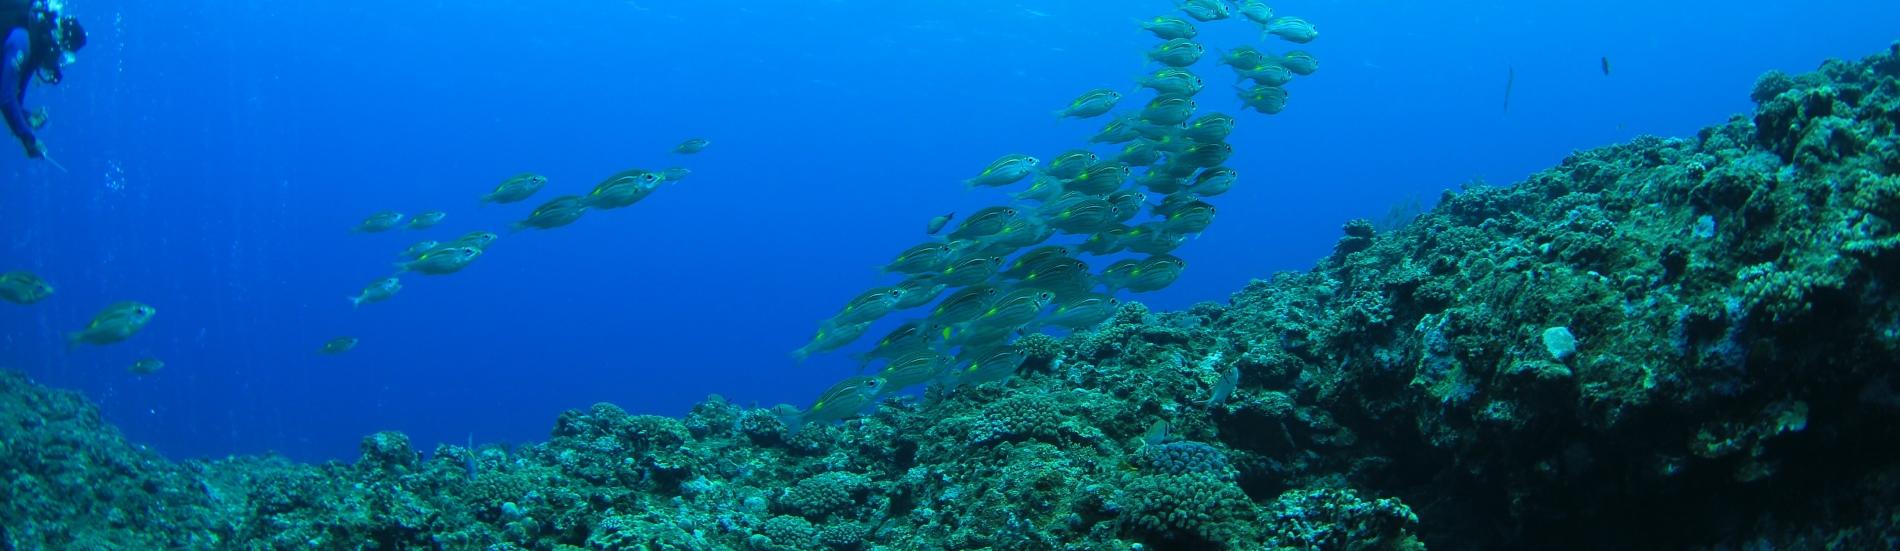 Underwater Education